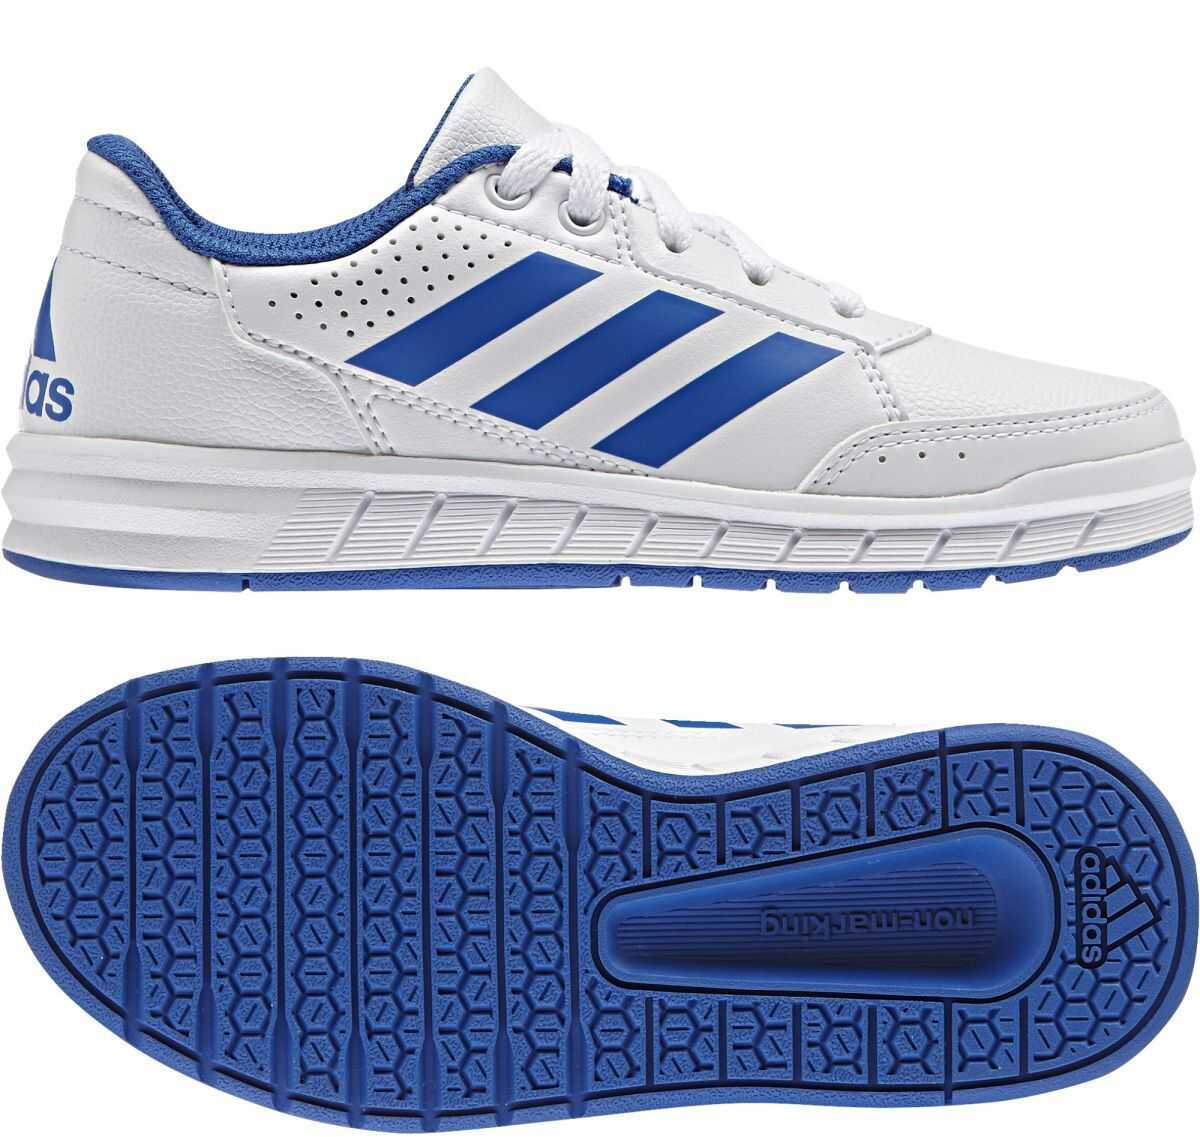 adidas AltaSport K FTWWHT/BLUE/FTWWHT